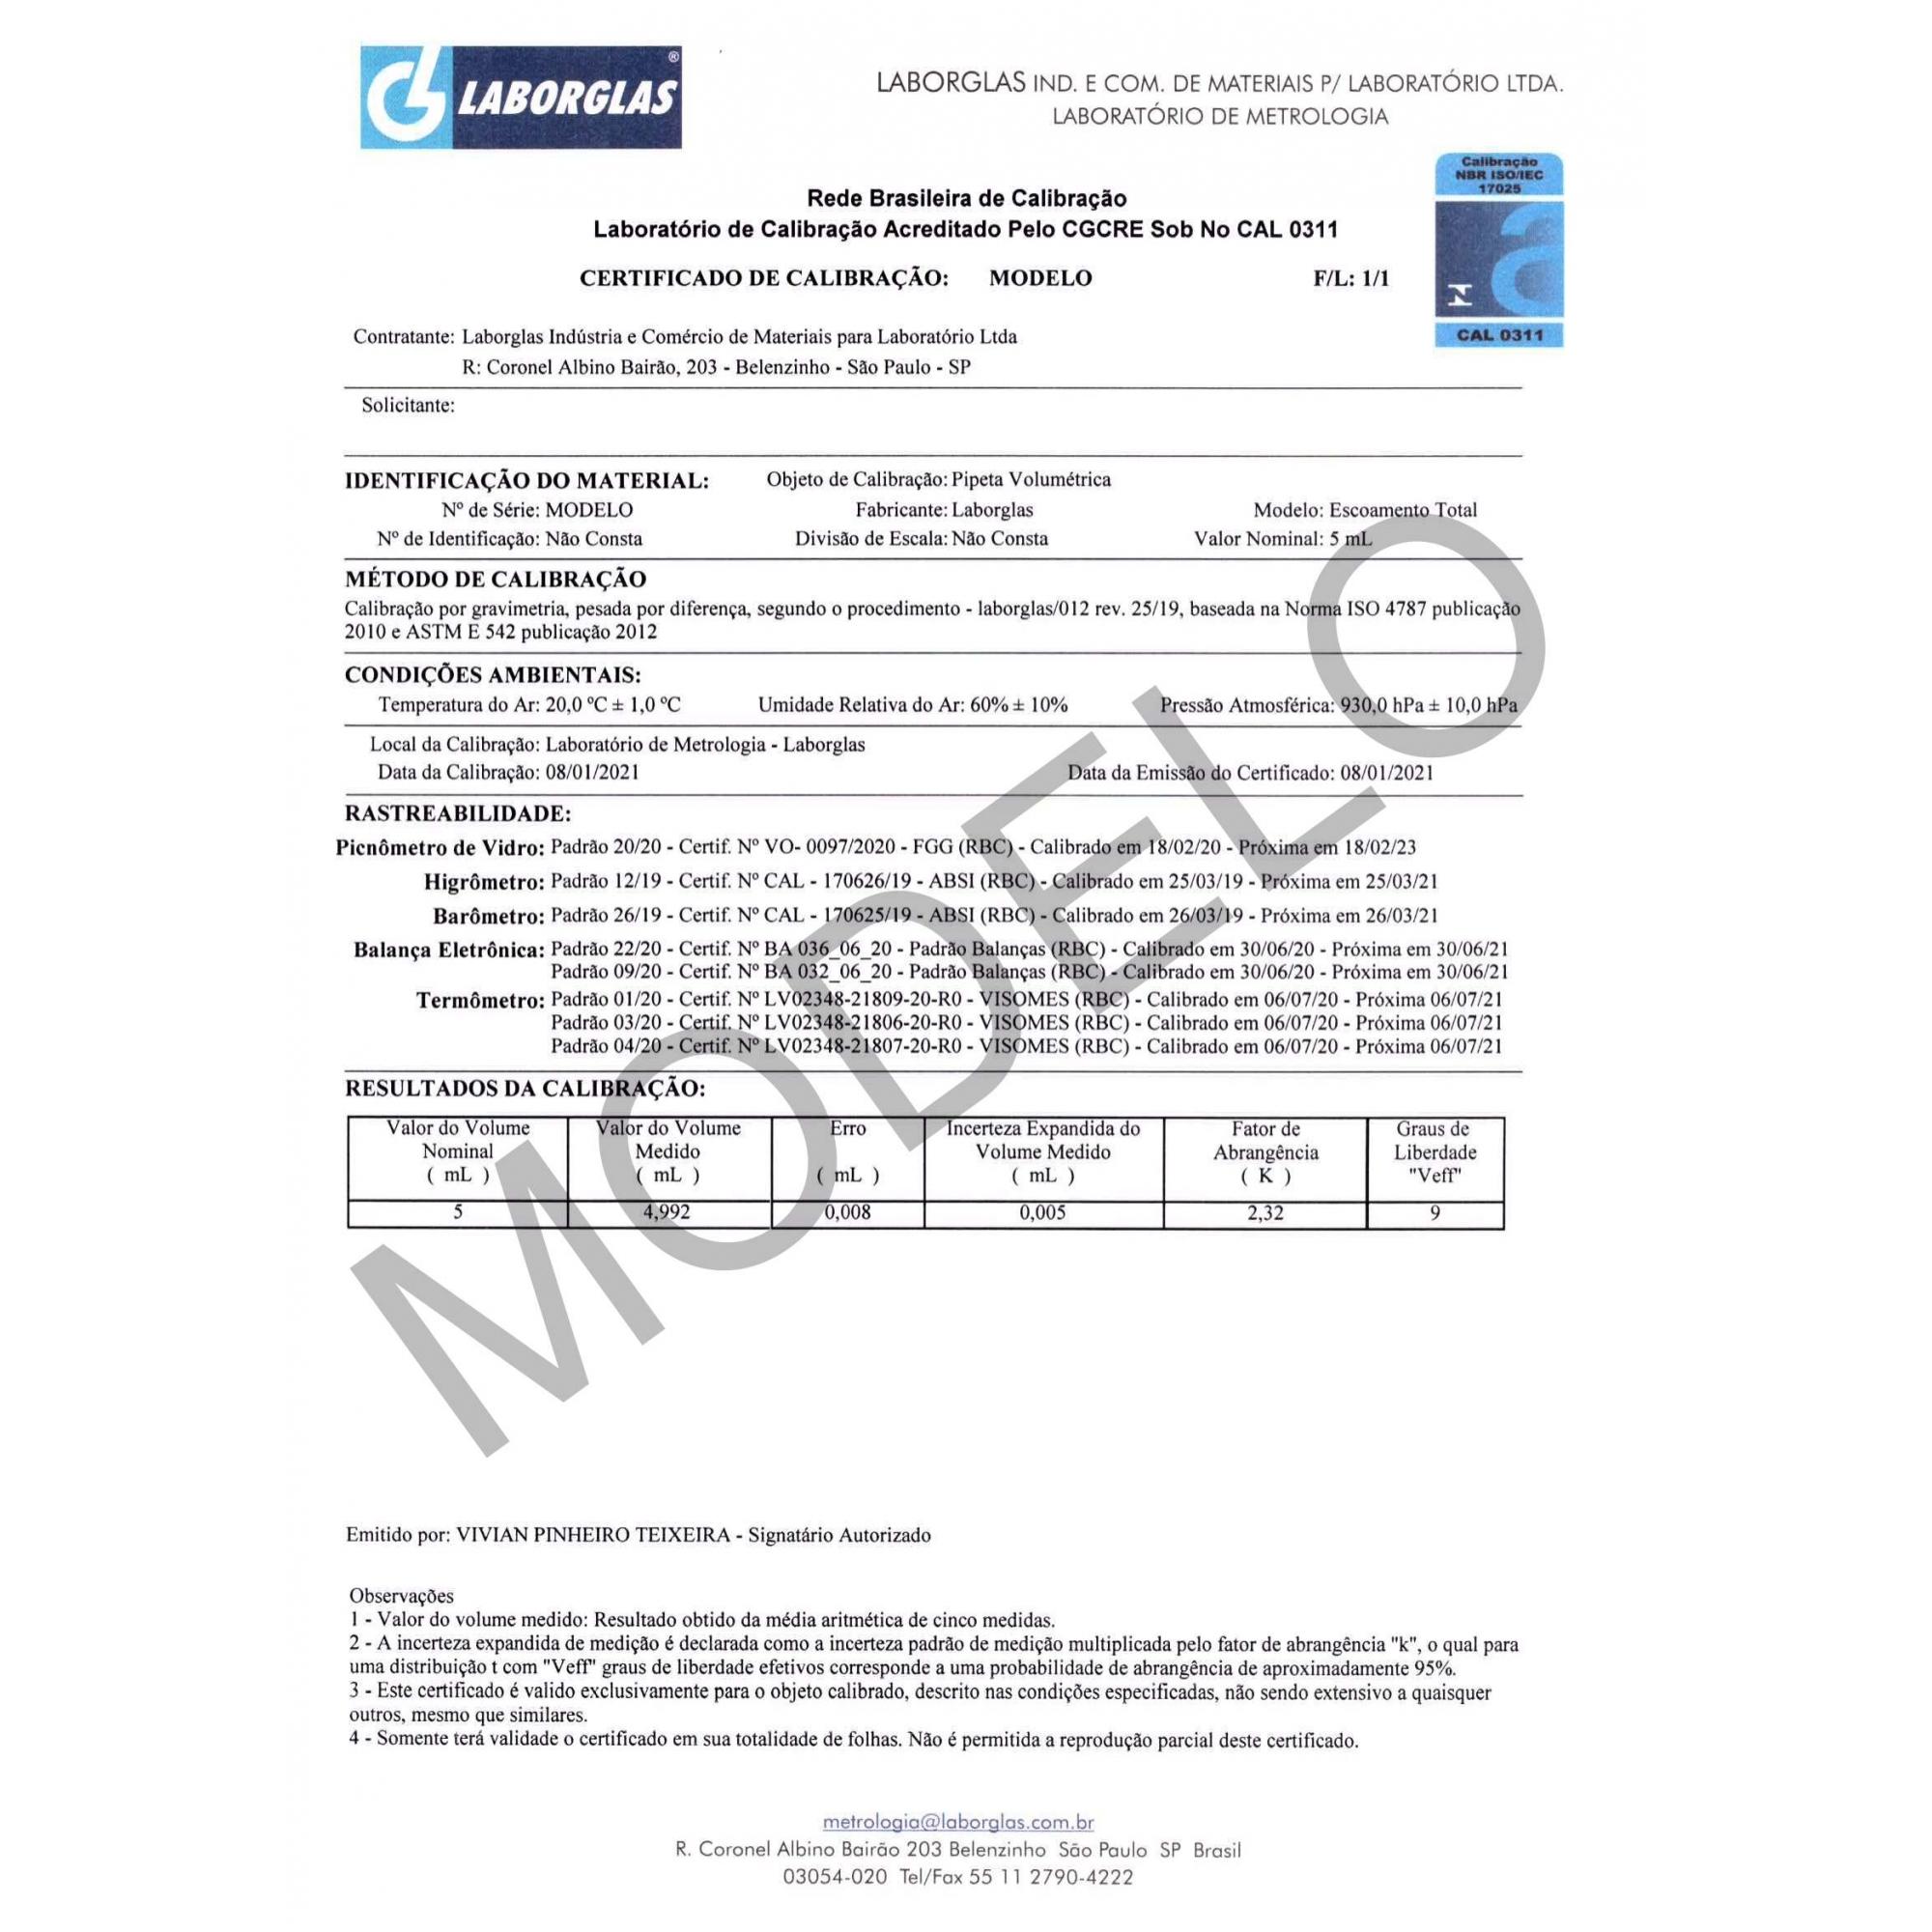 PIPETA VOLUMÉTRICA ESGOTAMENTO TOTAL 100 ML CERTIFICADO RBC - Laborglas - Cód. 9433717-R